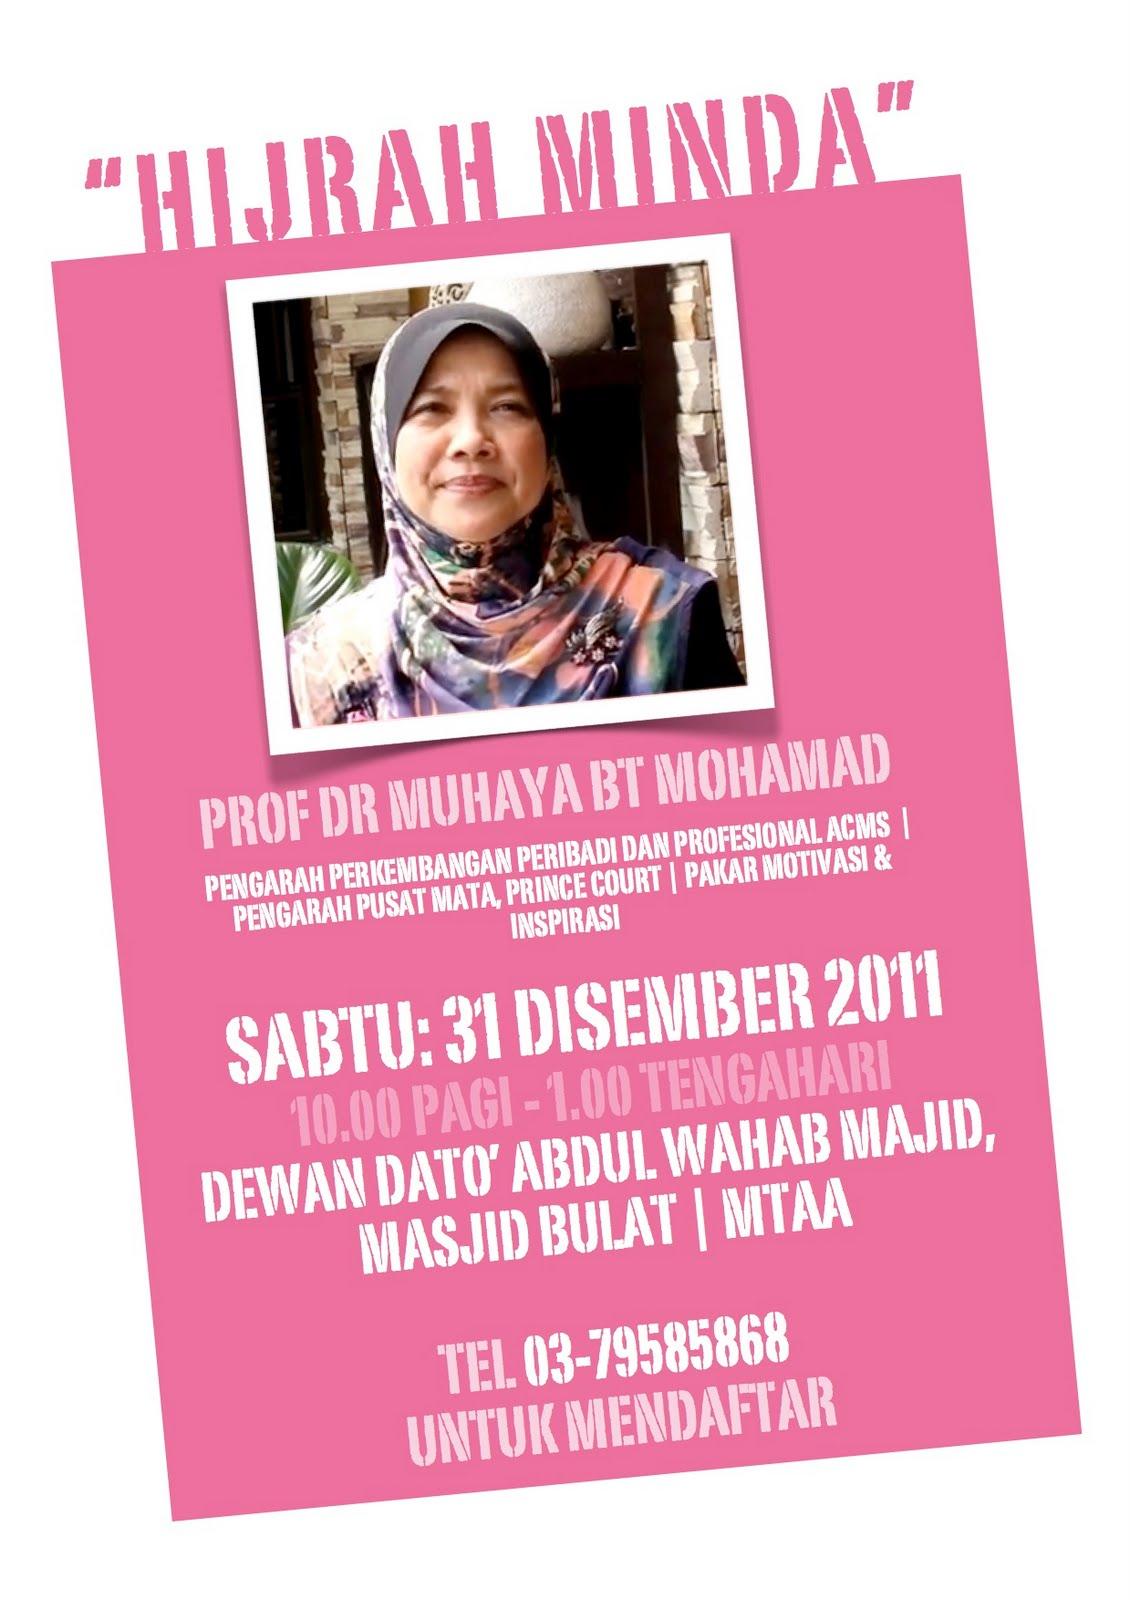 Hijrah Minda - Bicara Masjid Bulat bersama Prof Dr. Muhaya Mohamad